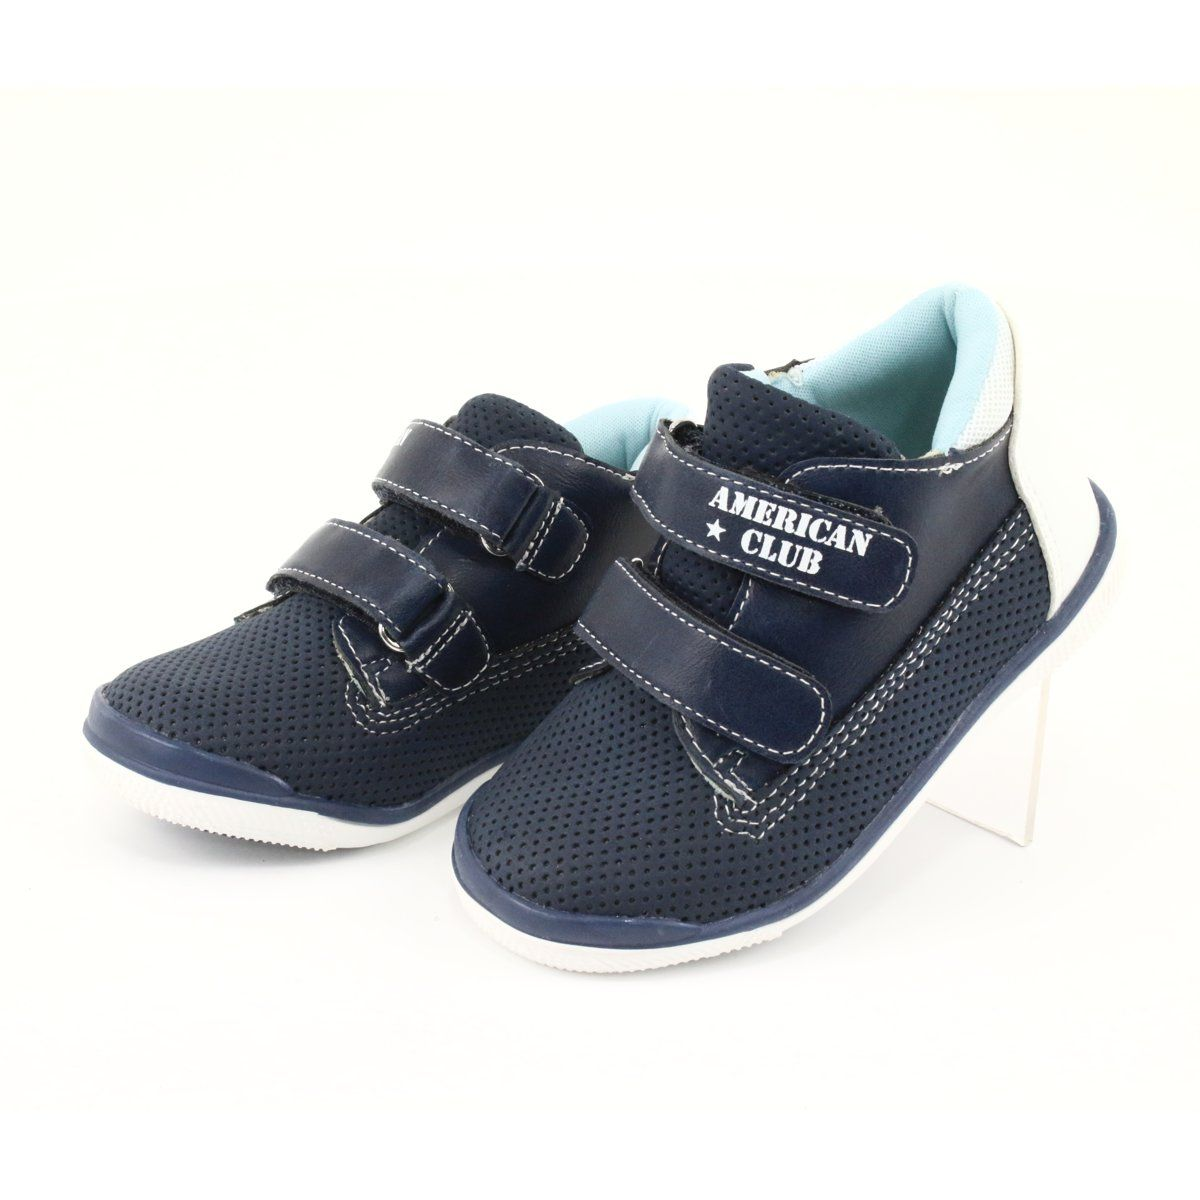 Trzewiki Na Rzep American Club Gc22 Biale Granatowe Baby Shoes Shoes Fashion